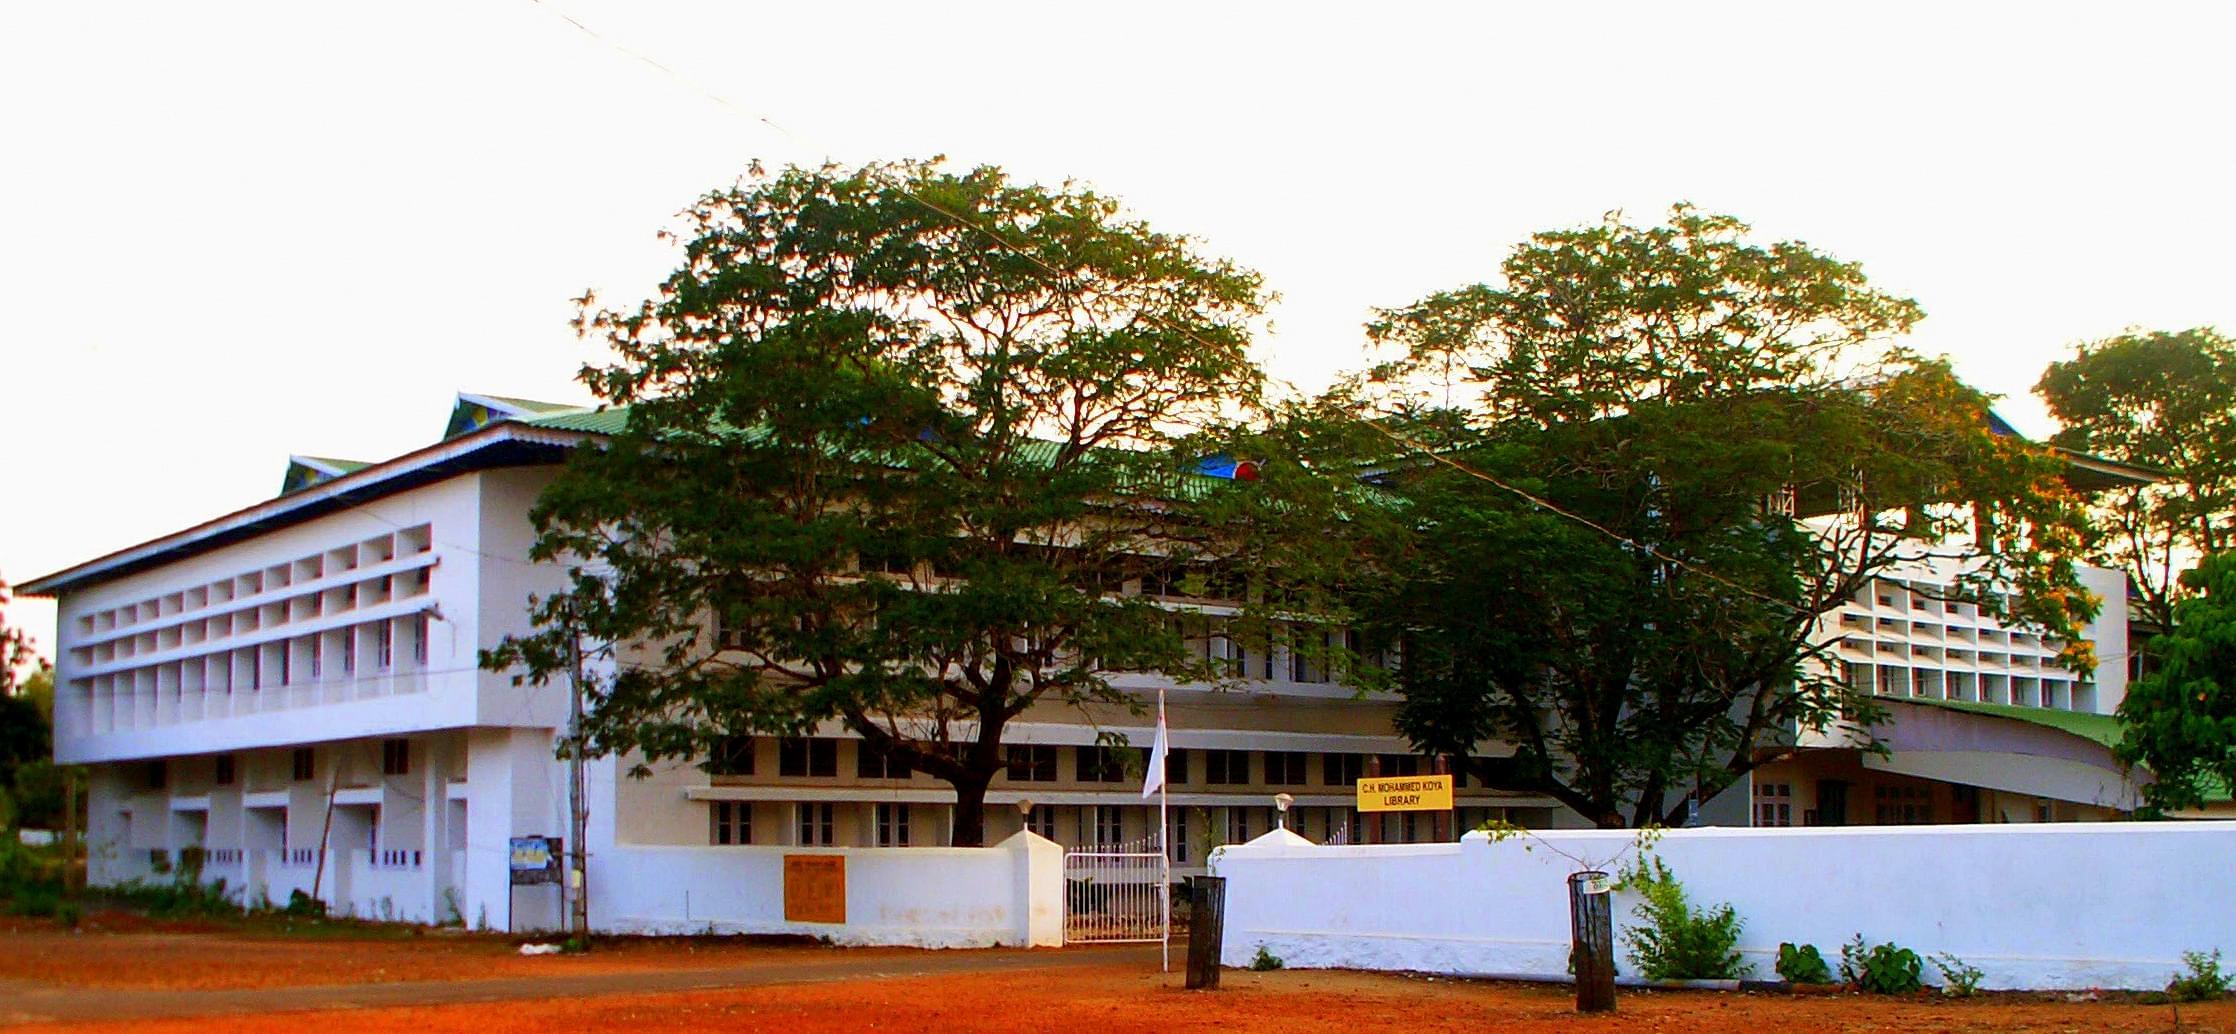 M.S.T.M Arts & Science College - [MSTM]